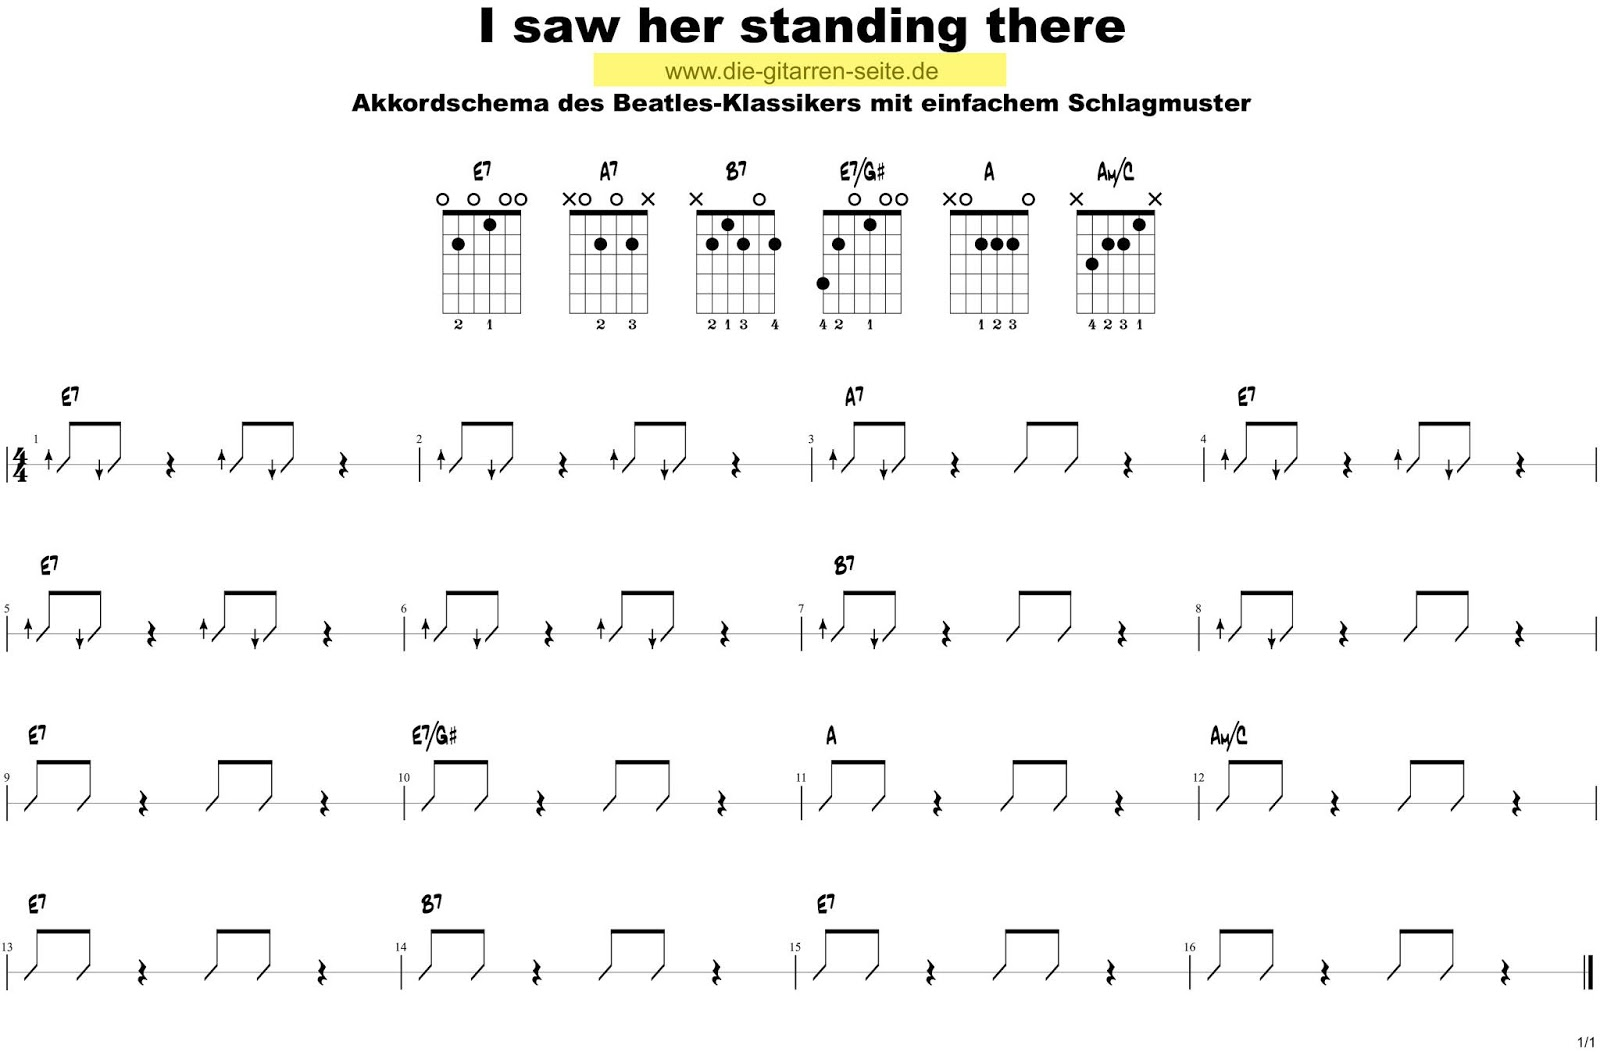 Die Gitarren Seite I saw her standing there Chords Strumming